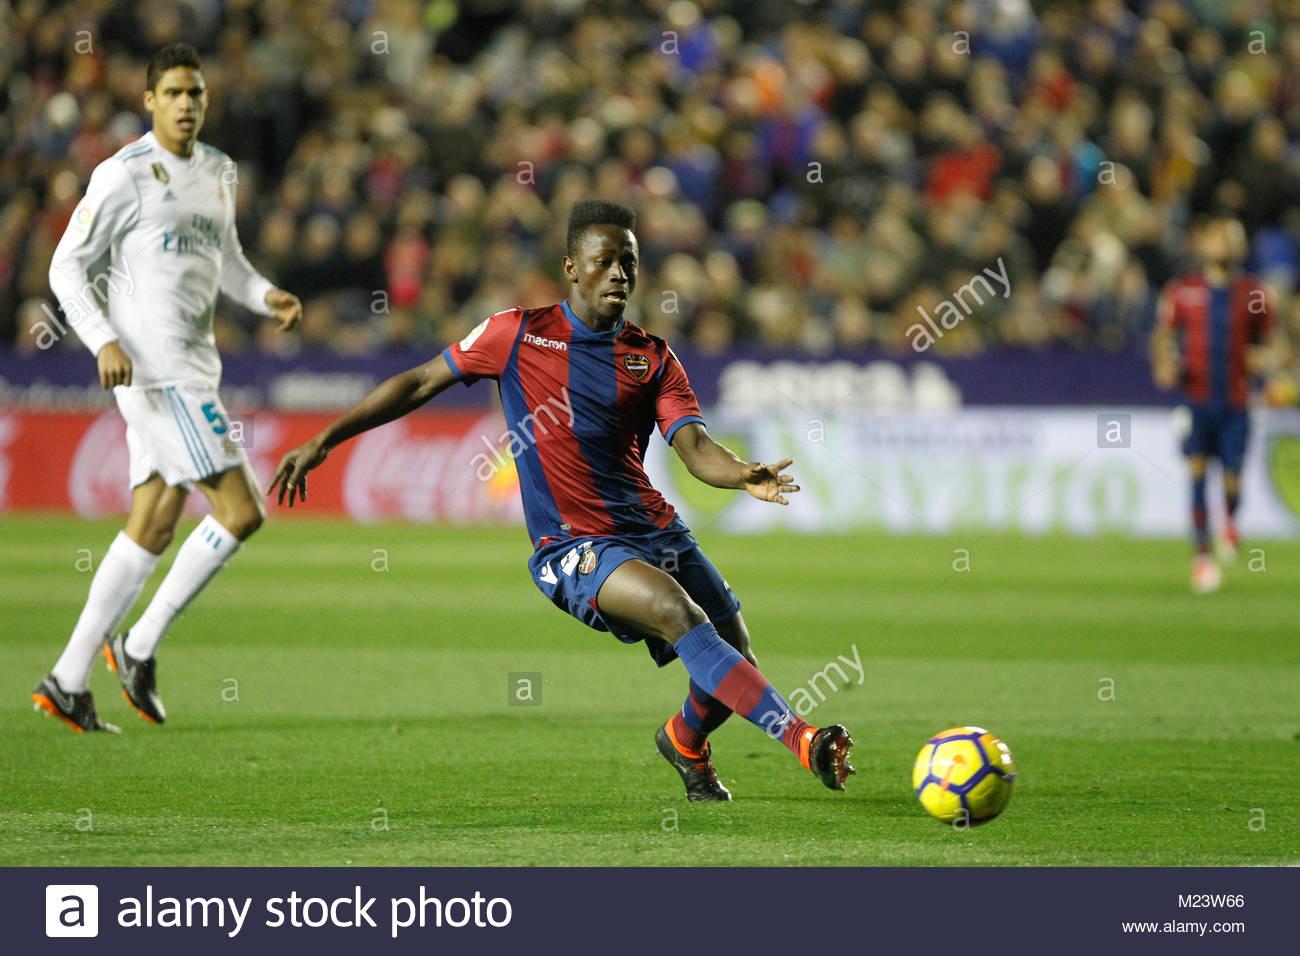 Levante's Emmanuel Boateng fron Ghana during a La Liga match - Stock Image